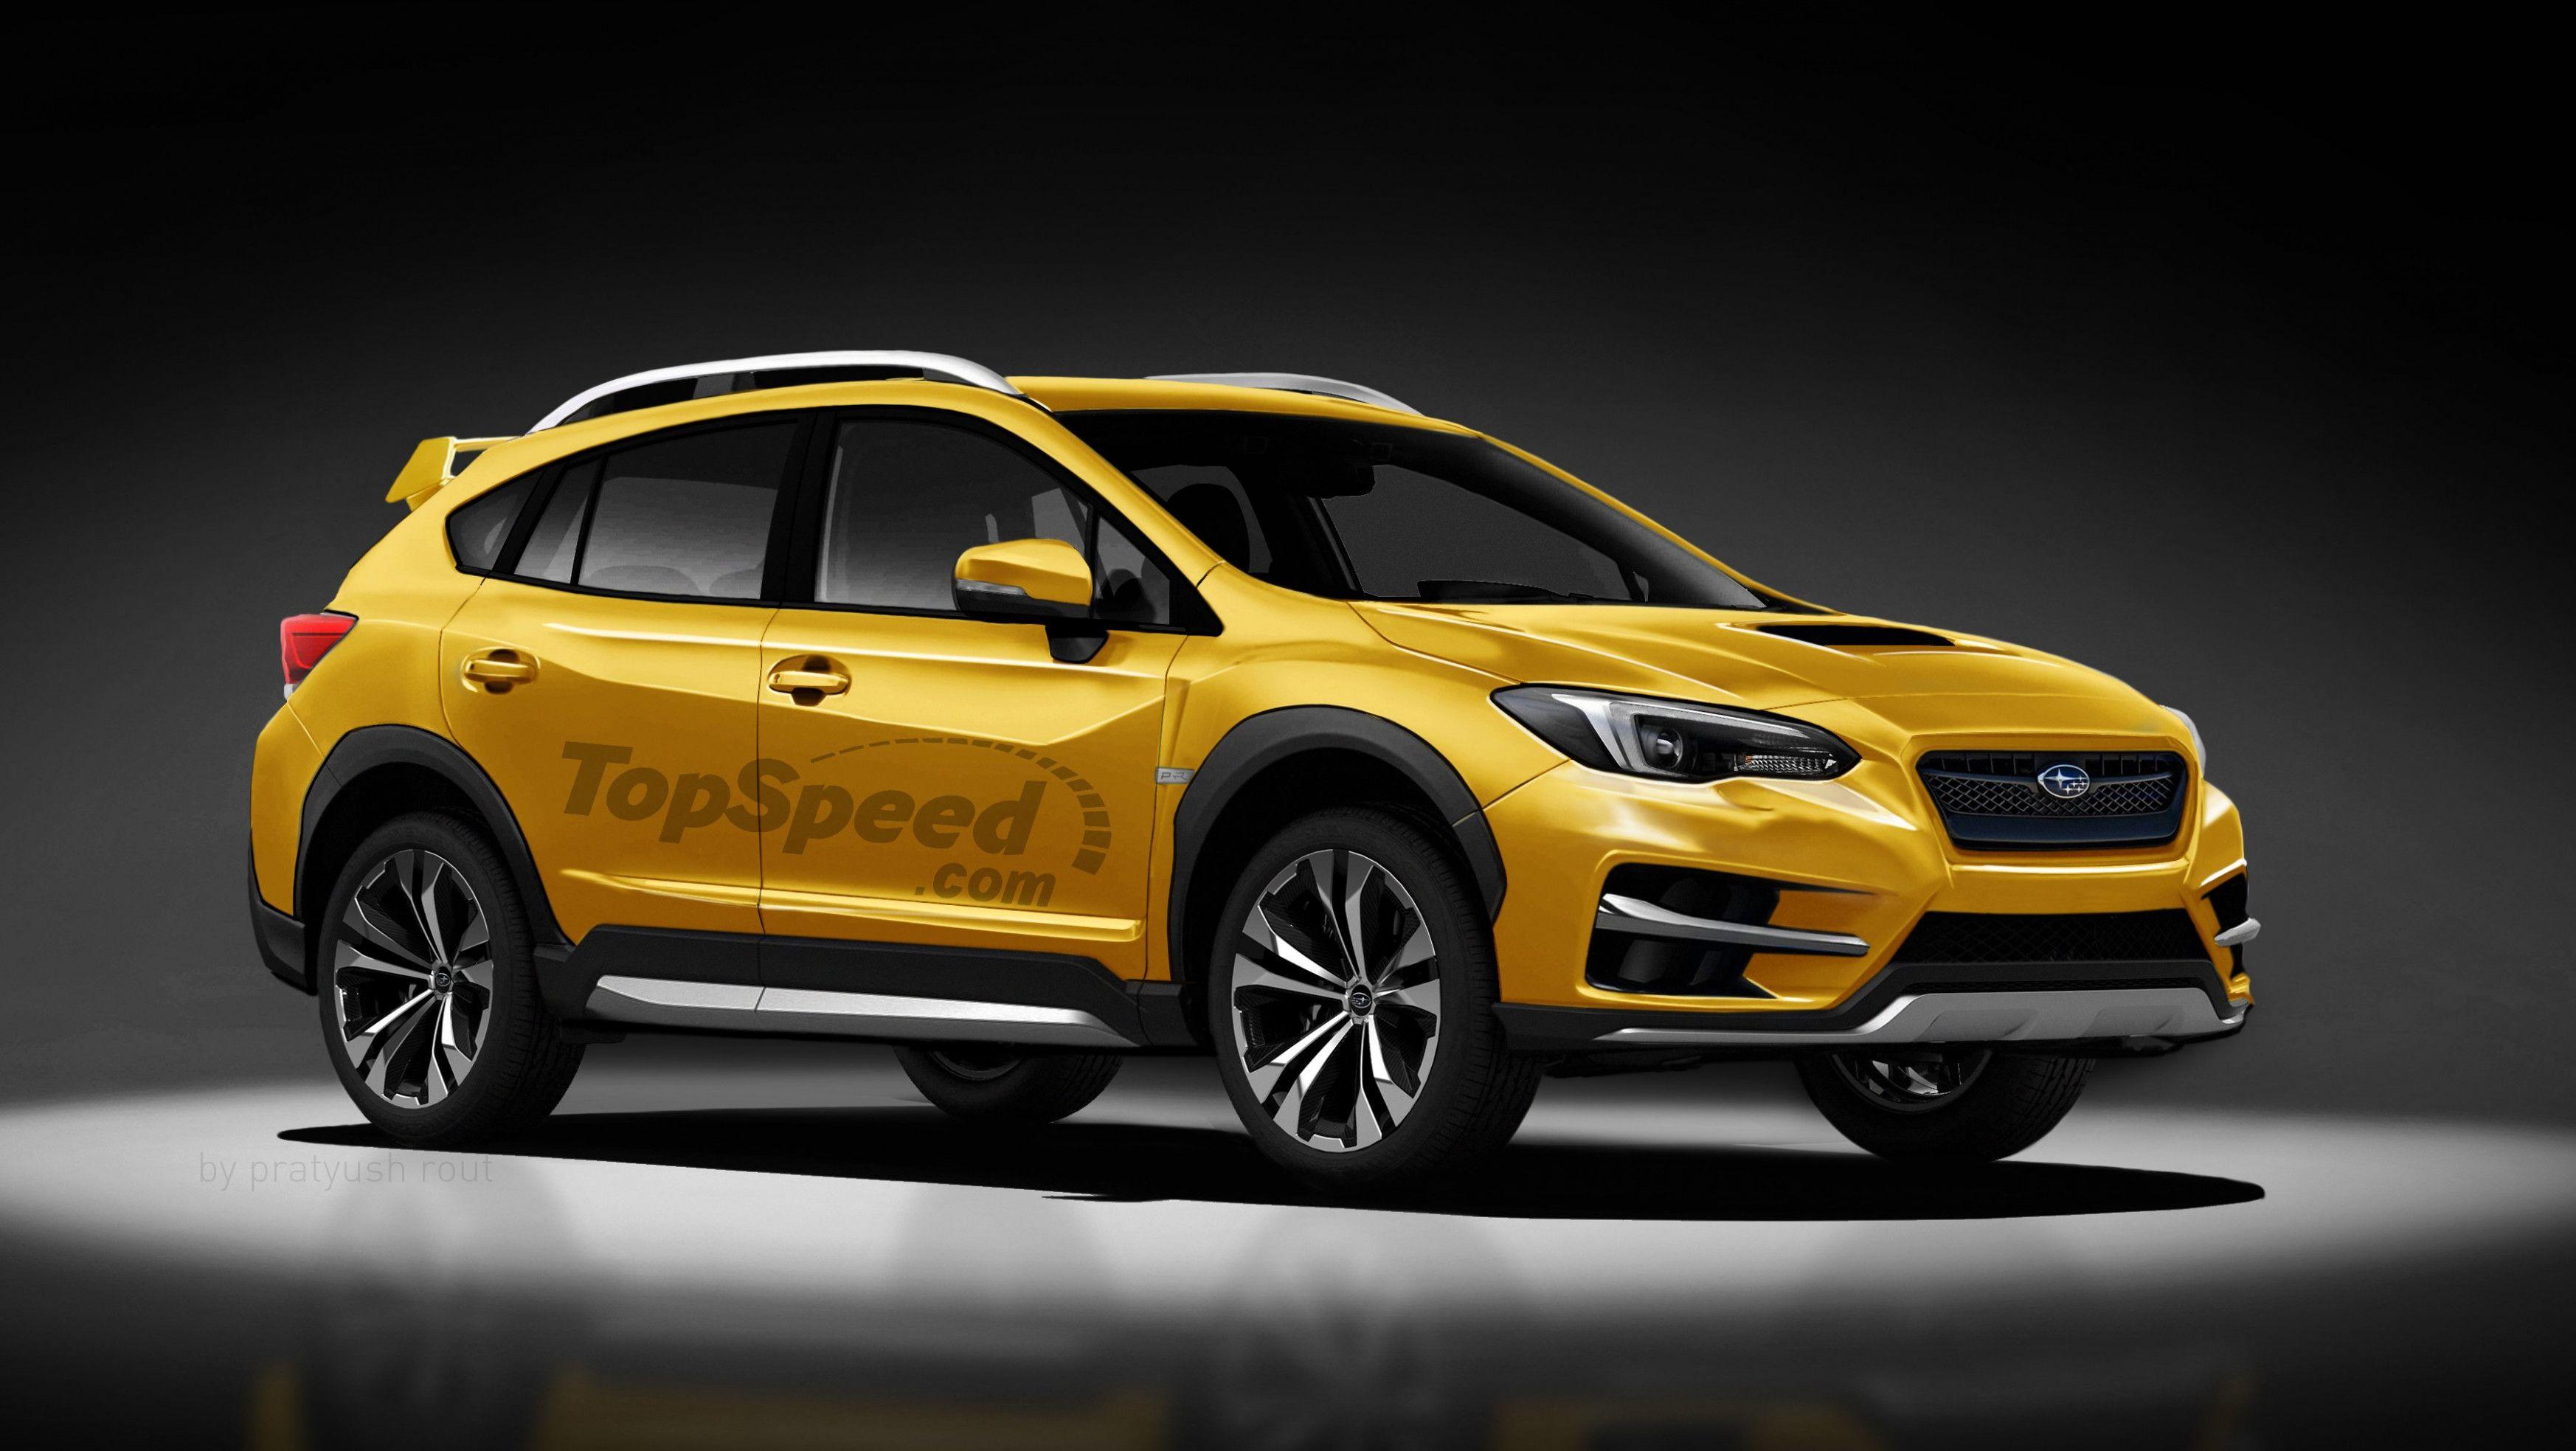 2020 Subaru Xv Gt First Drive Mobil Teknologi